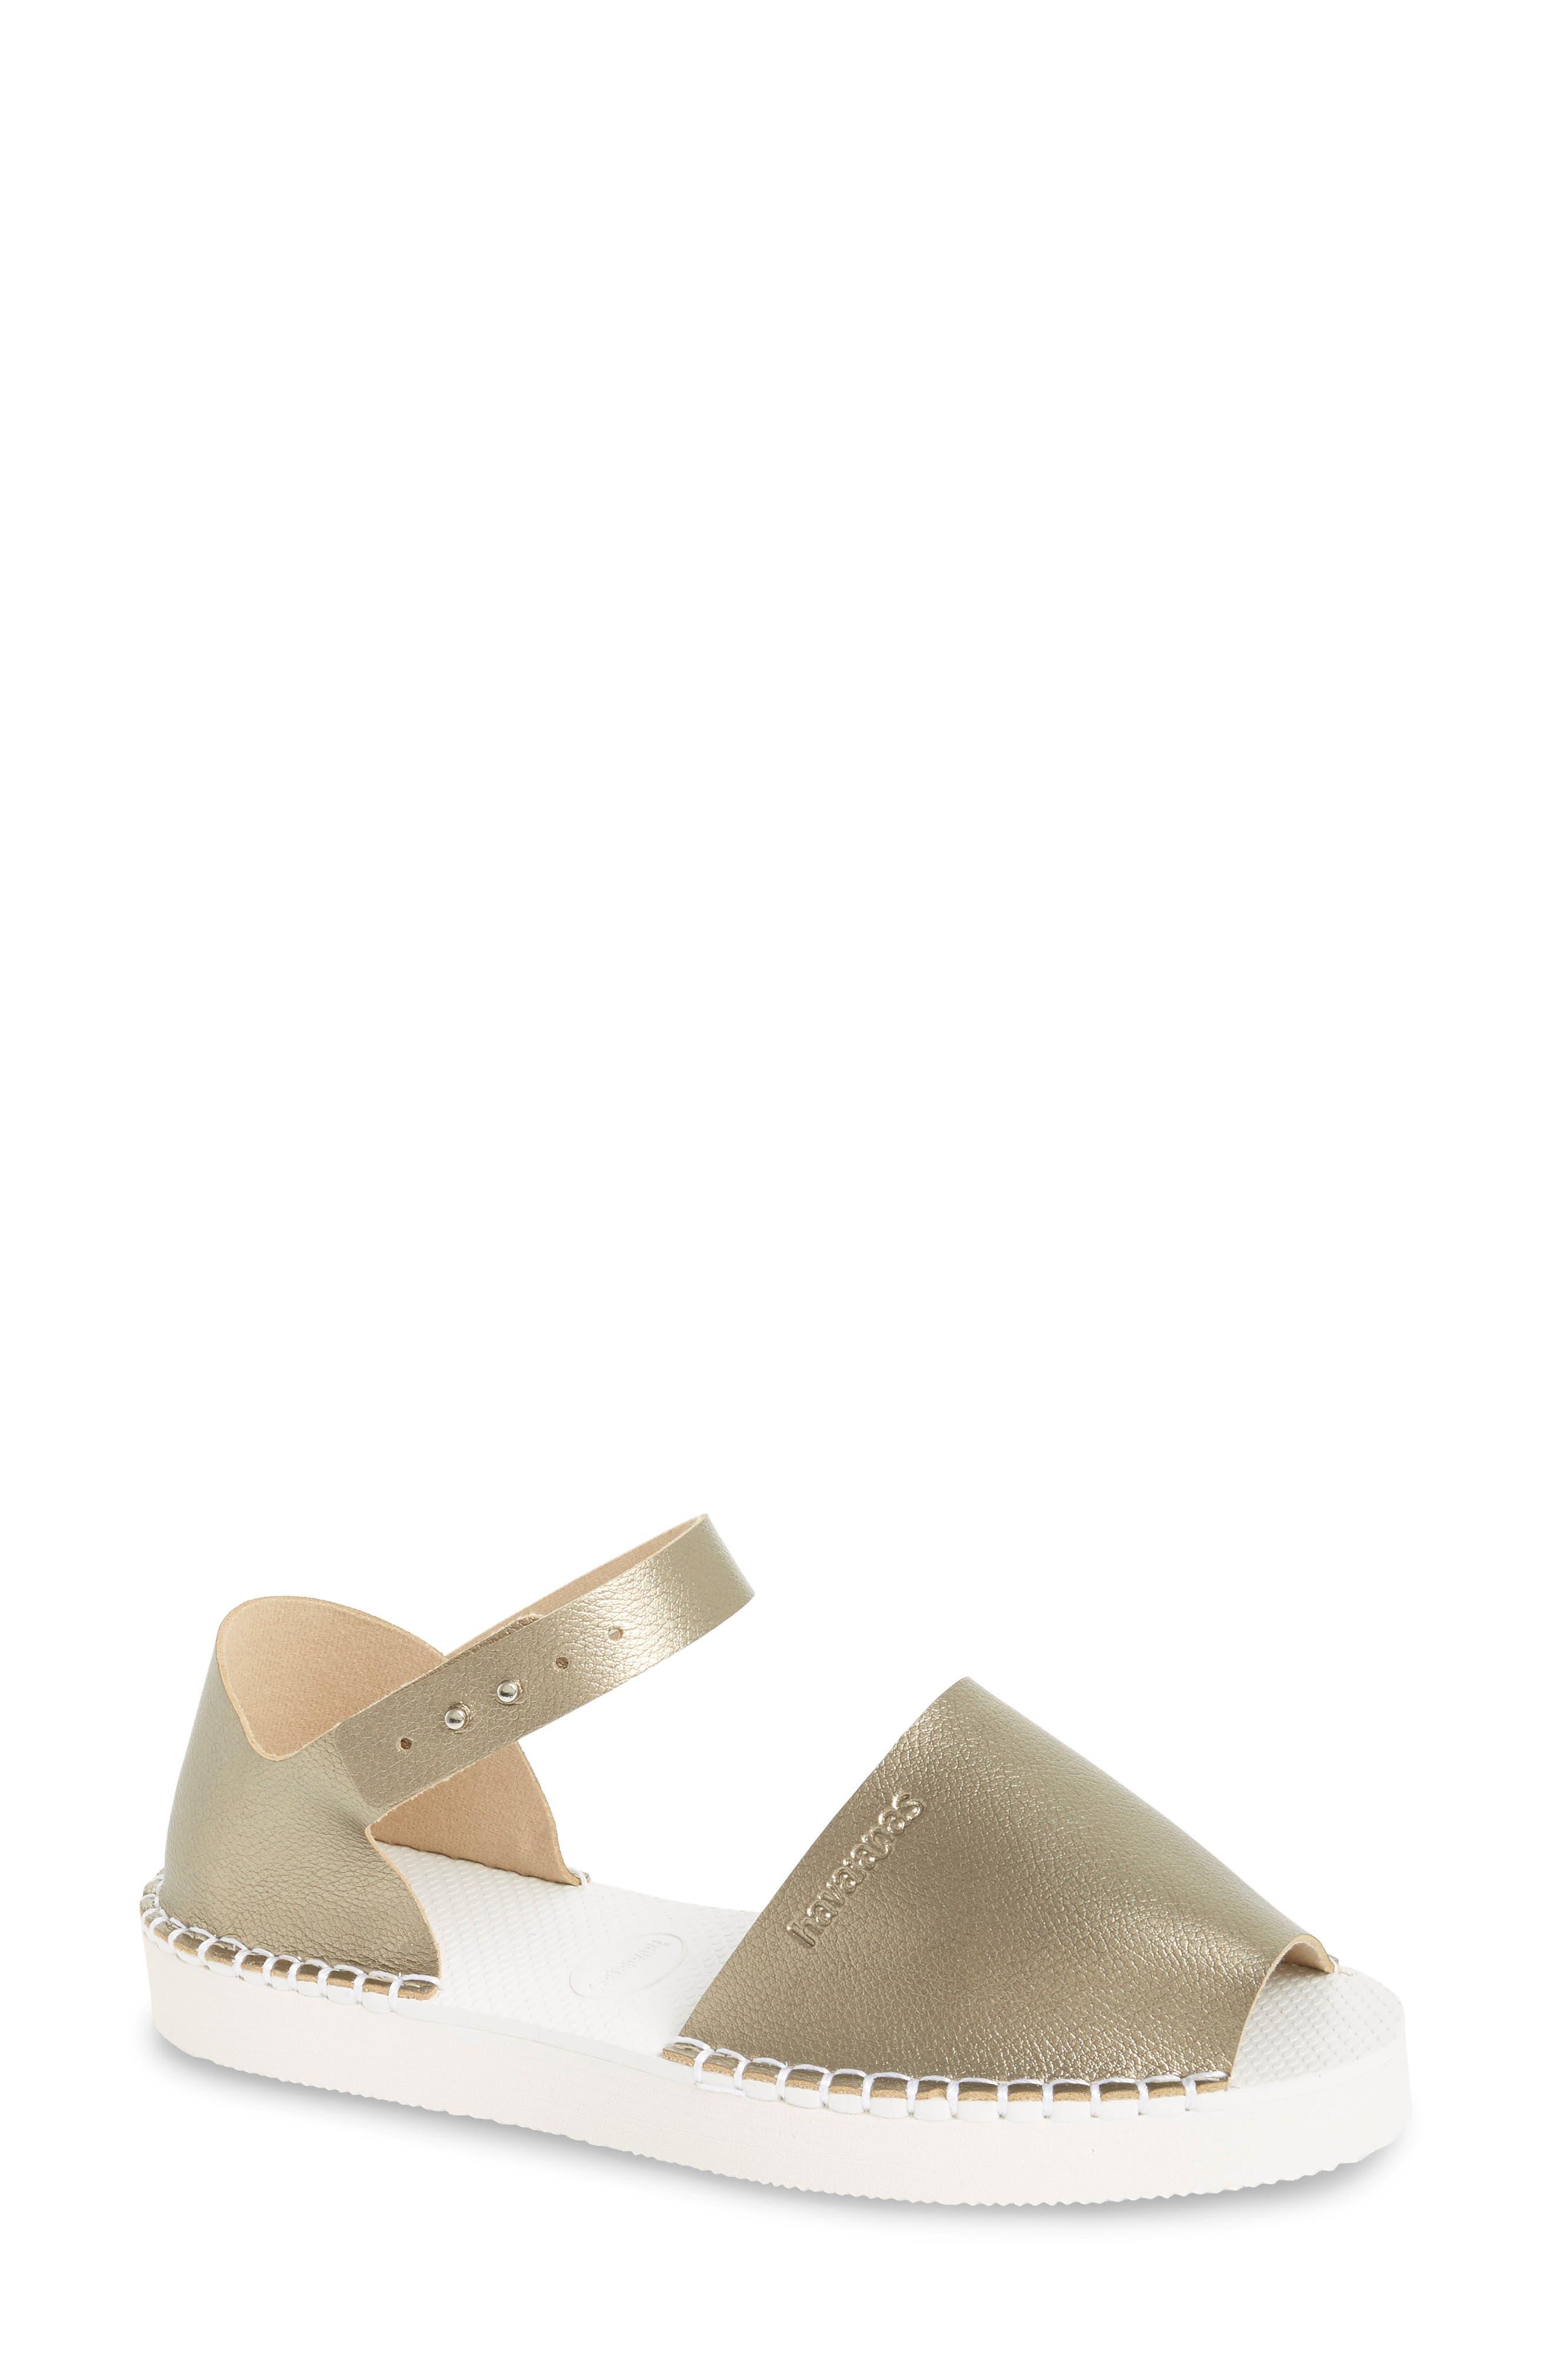 Flatform Fashion Sandal,                             Main thumbnail 1, color,                             Golden